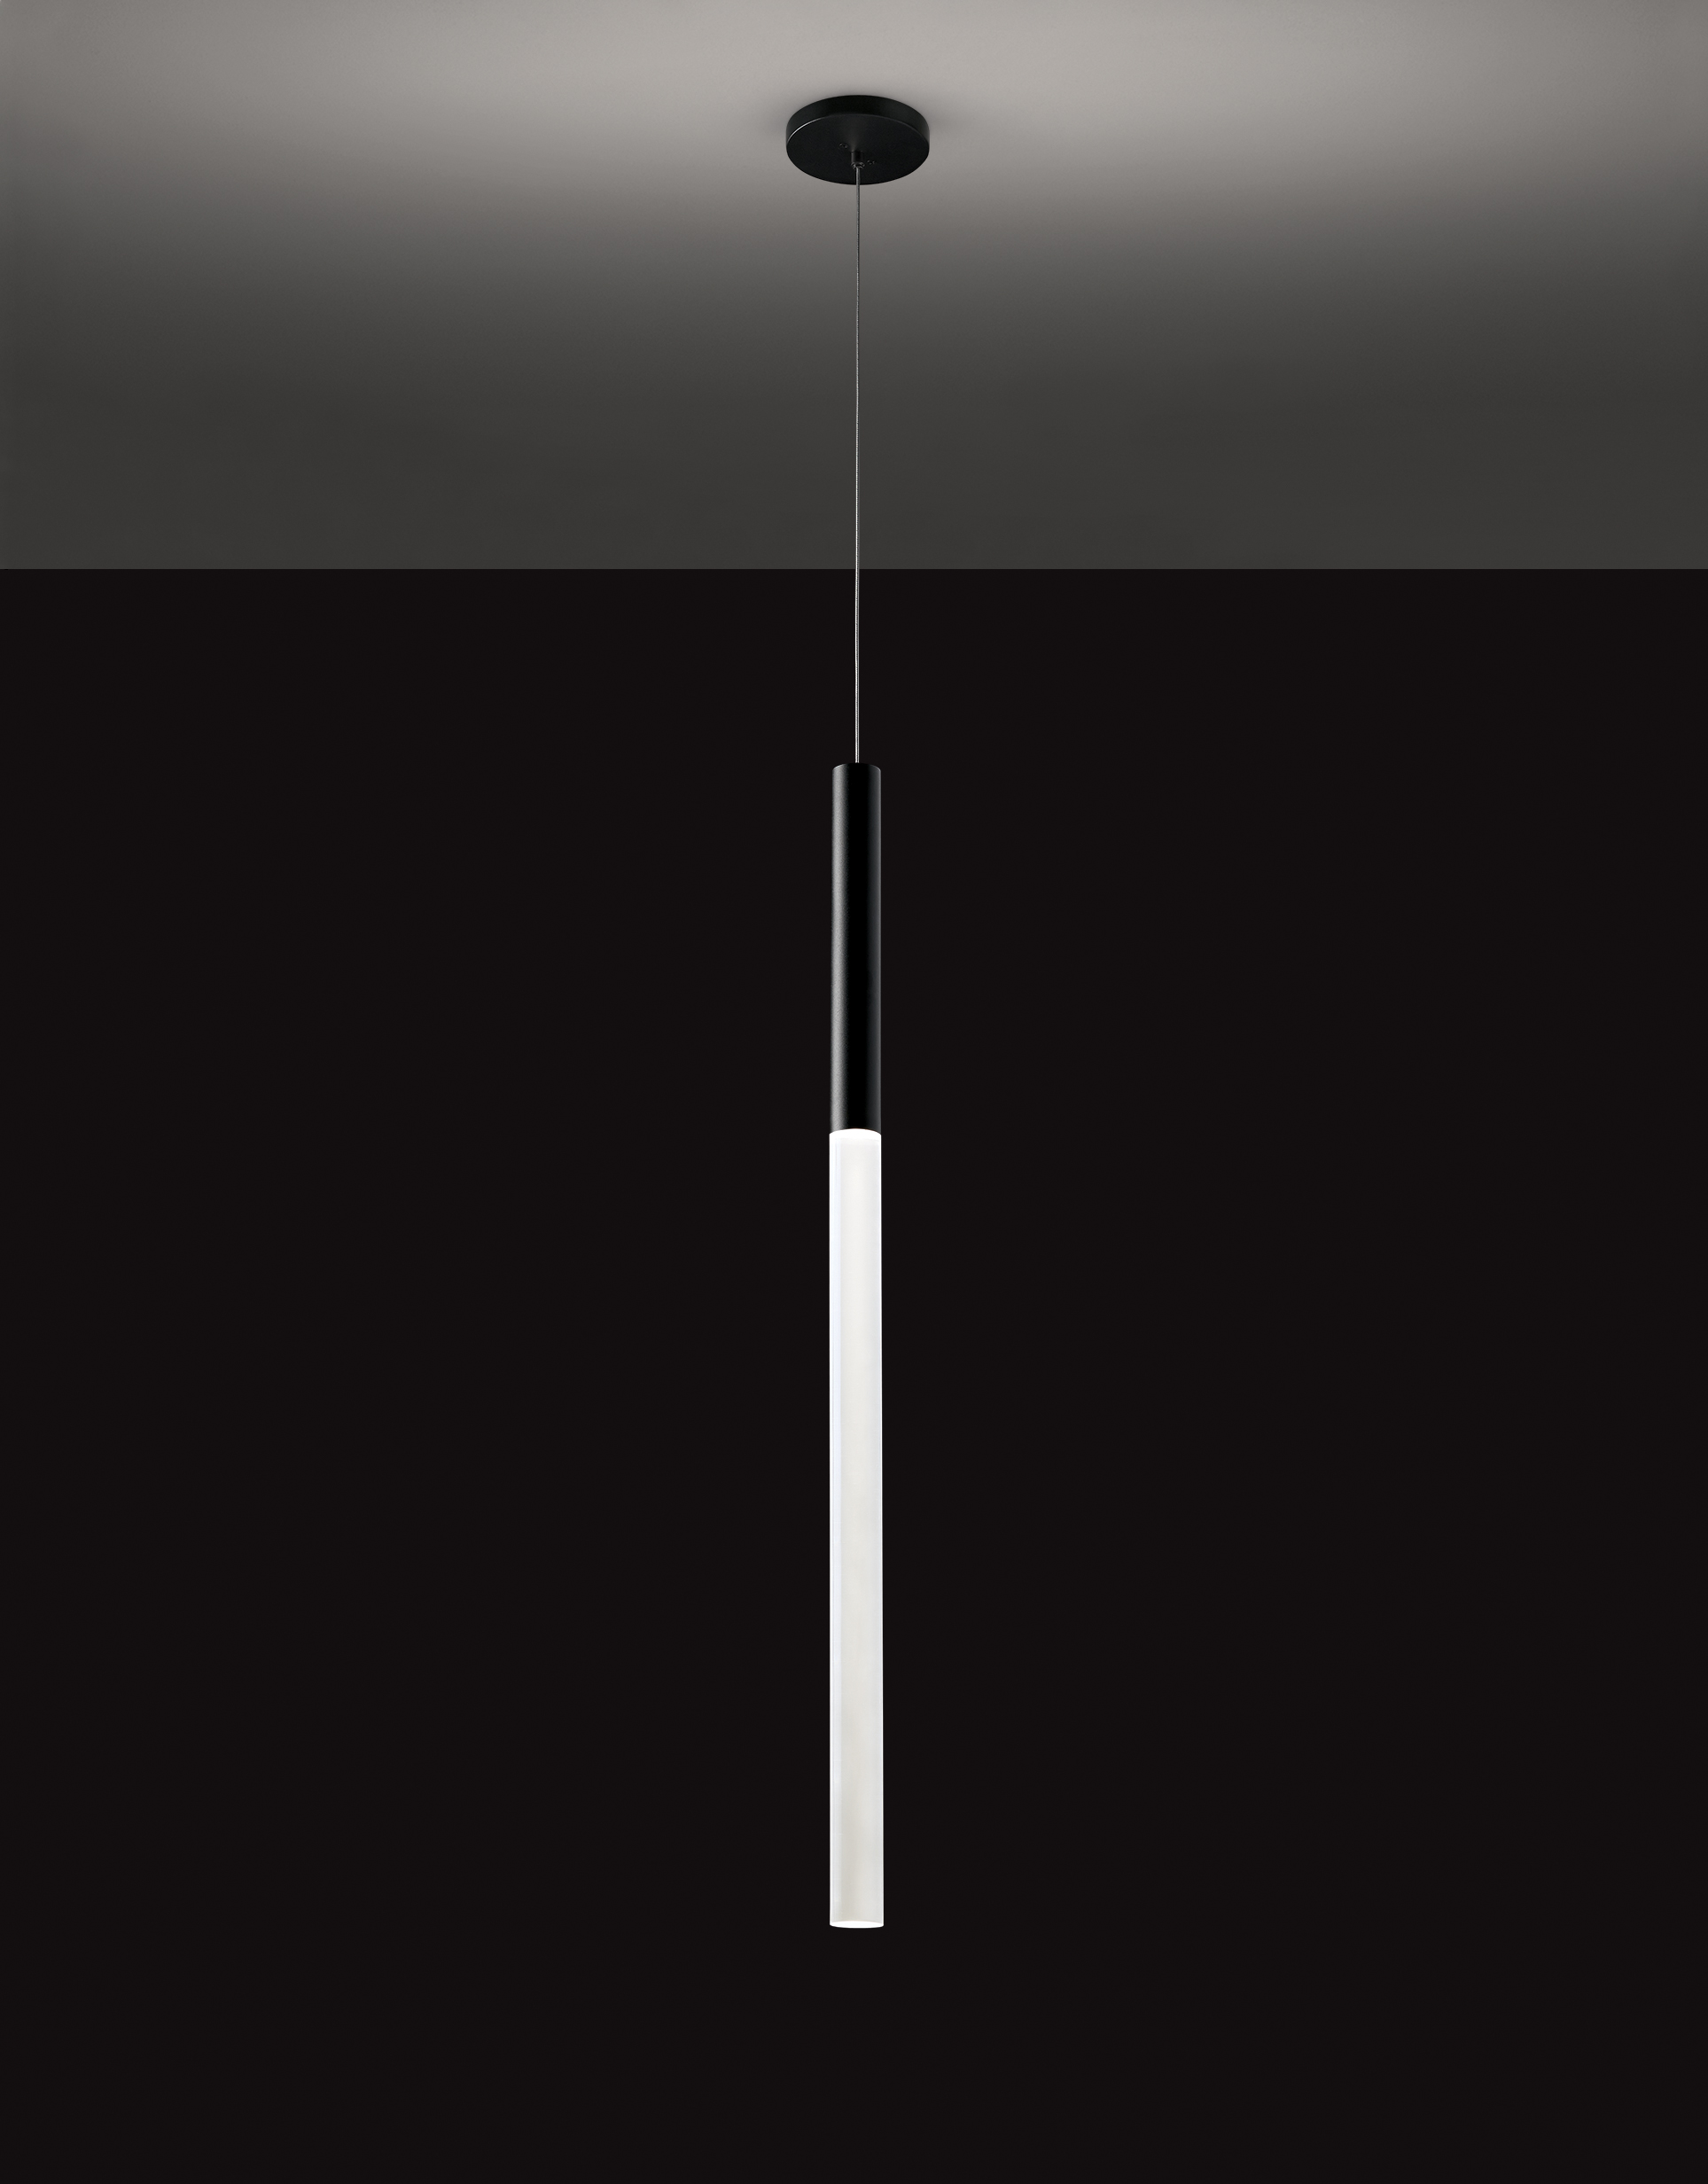 Hammered Steel Pendant Light